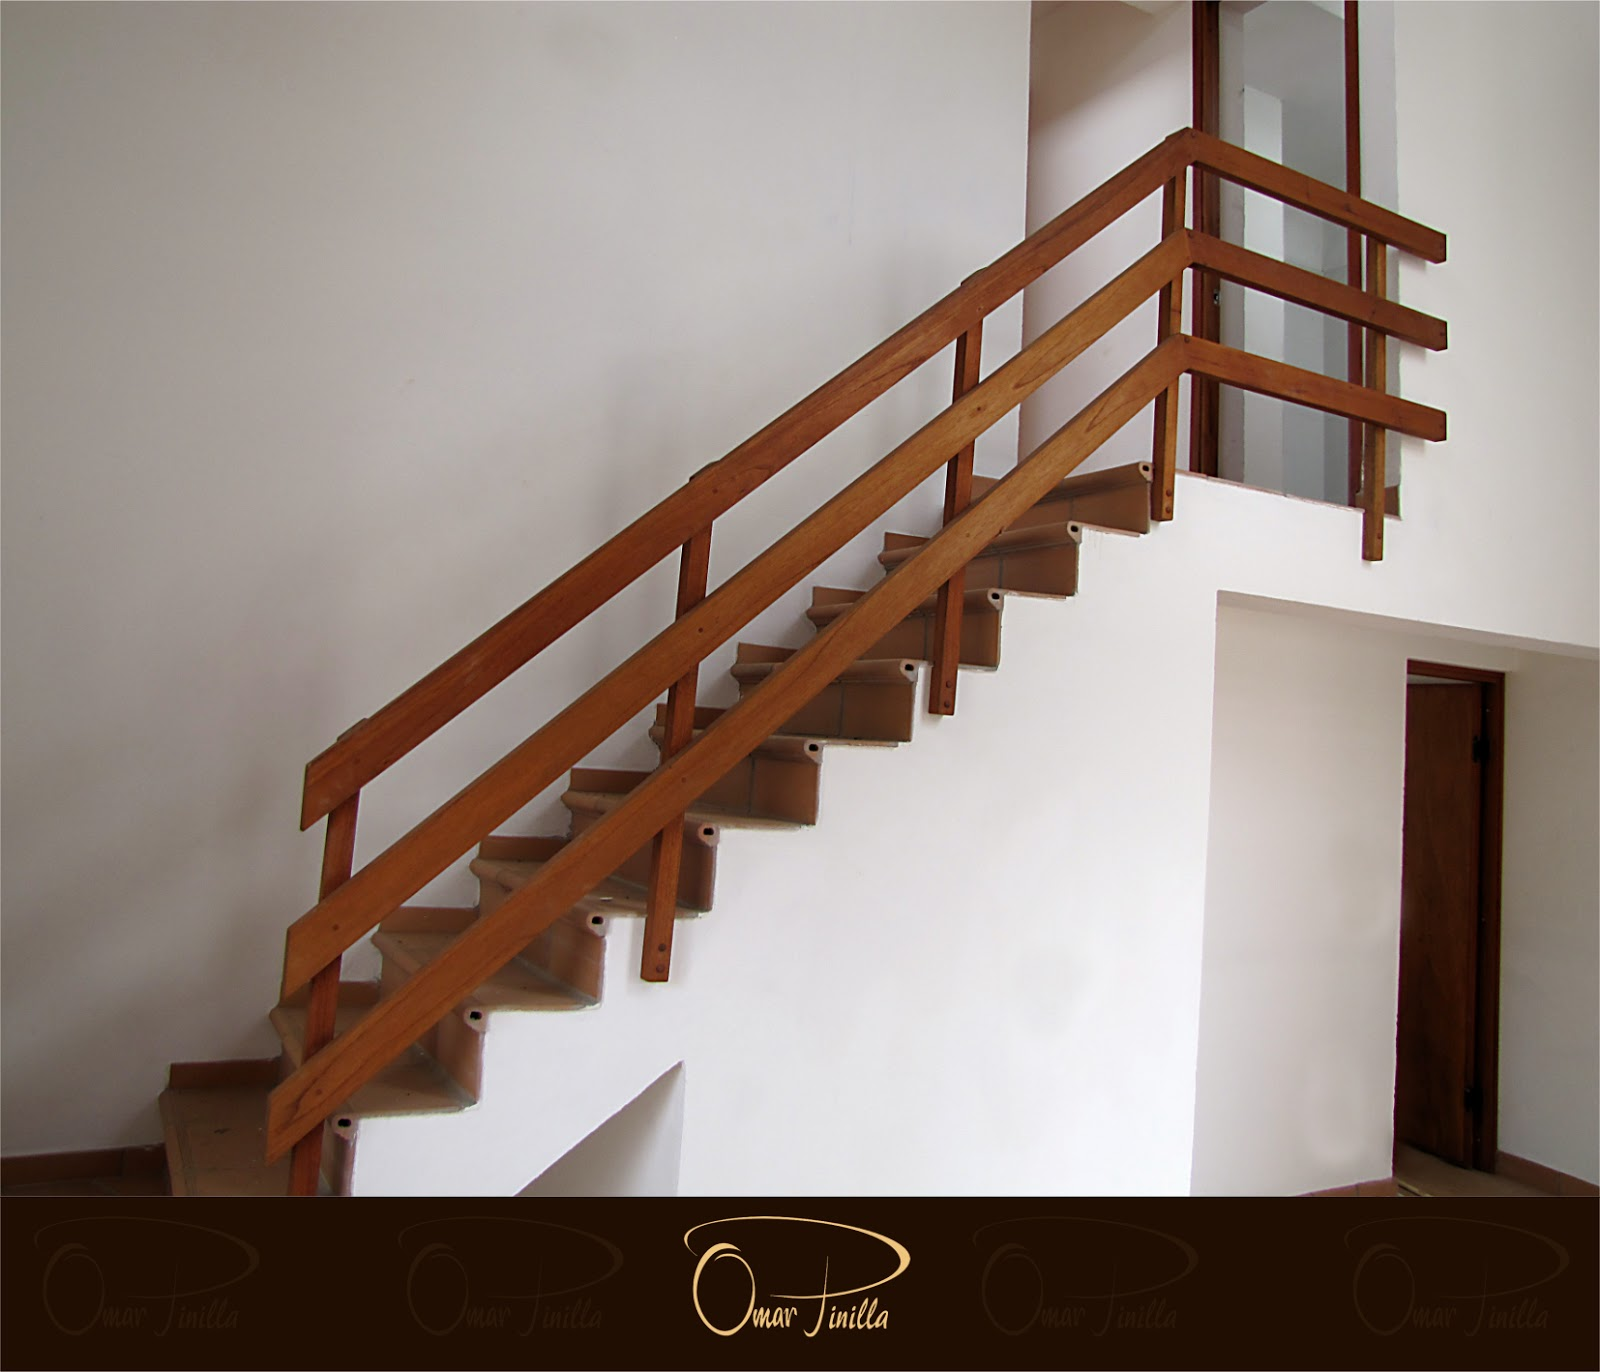 Muebles omar pinilla escaleras barandas - Barandas de madera para escaleras ...